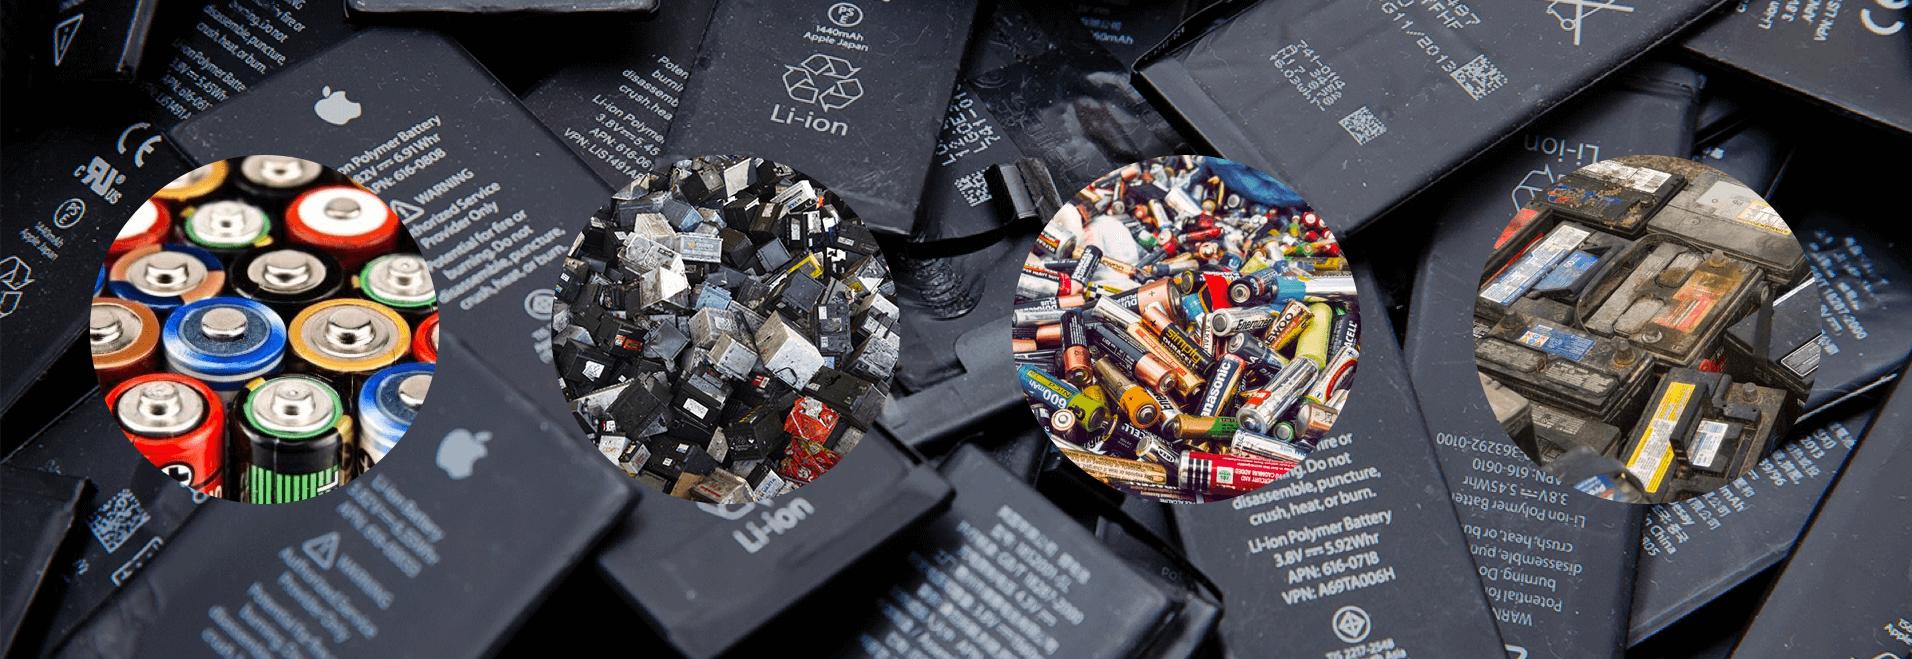 Tesla Battery Recycling: Revolutionary Closed Loop System